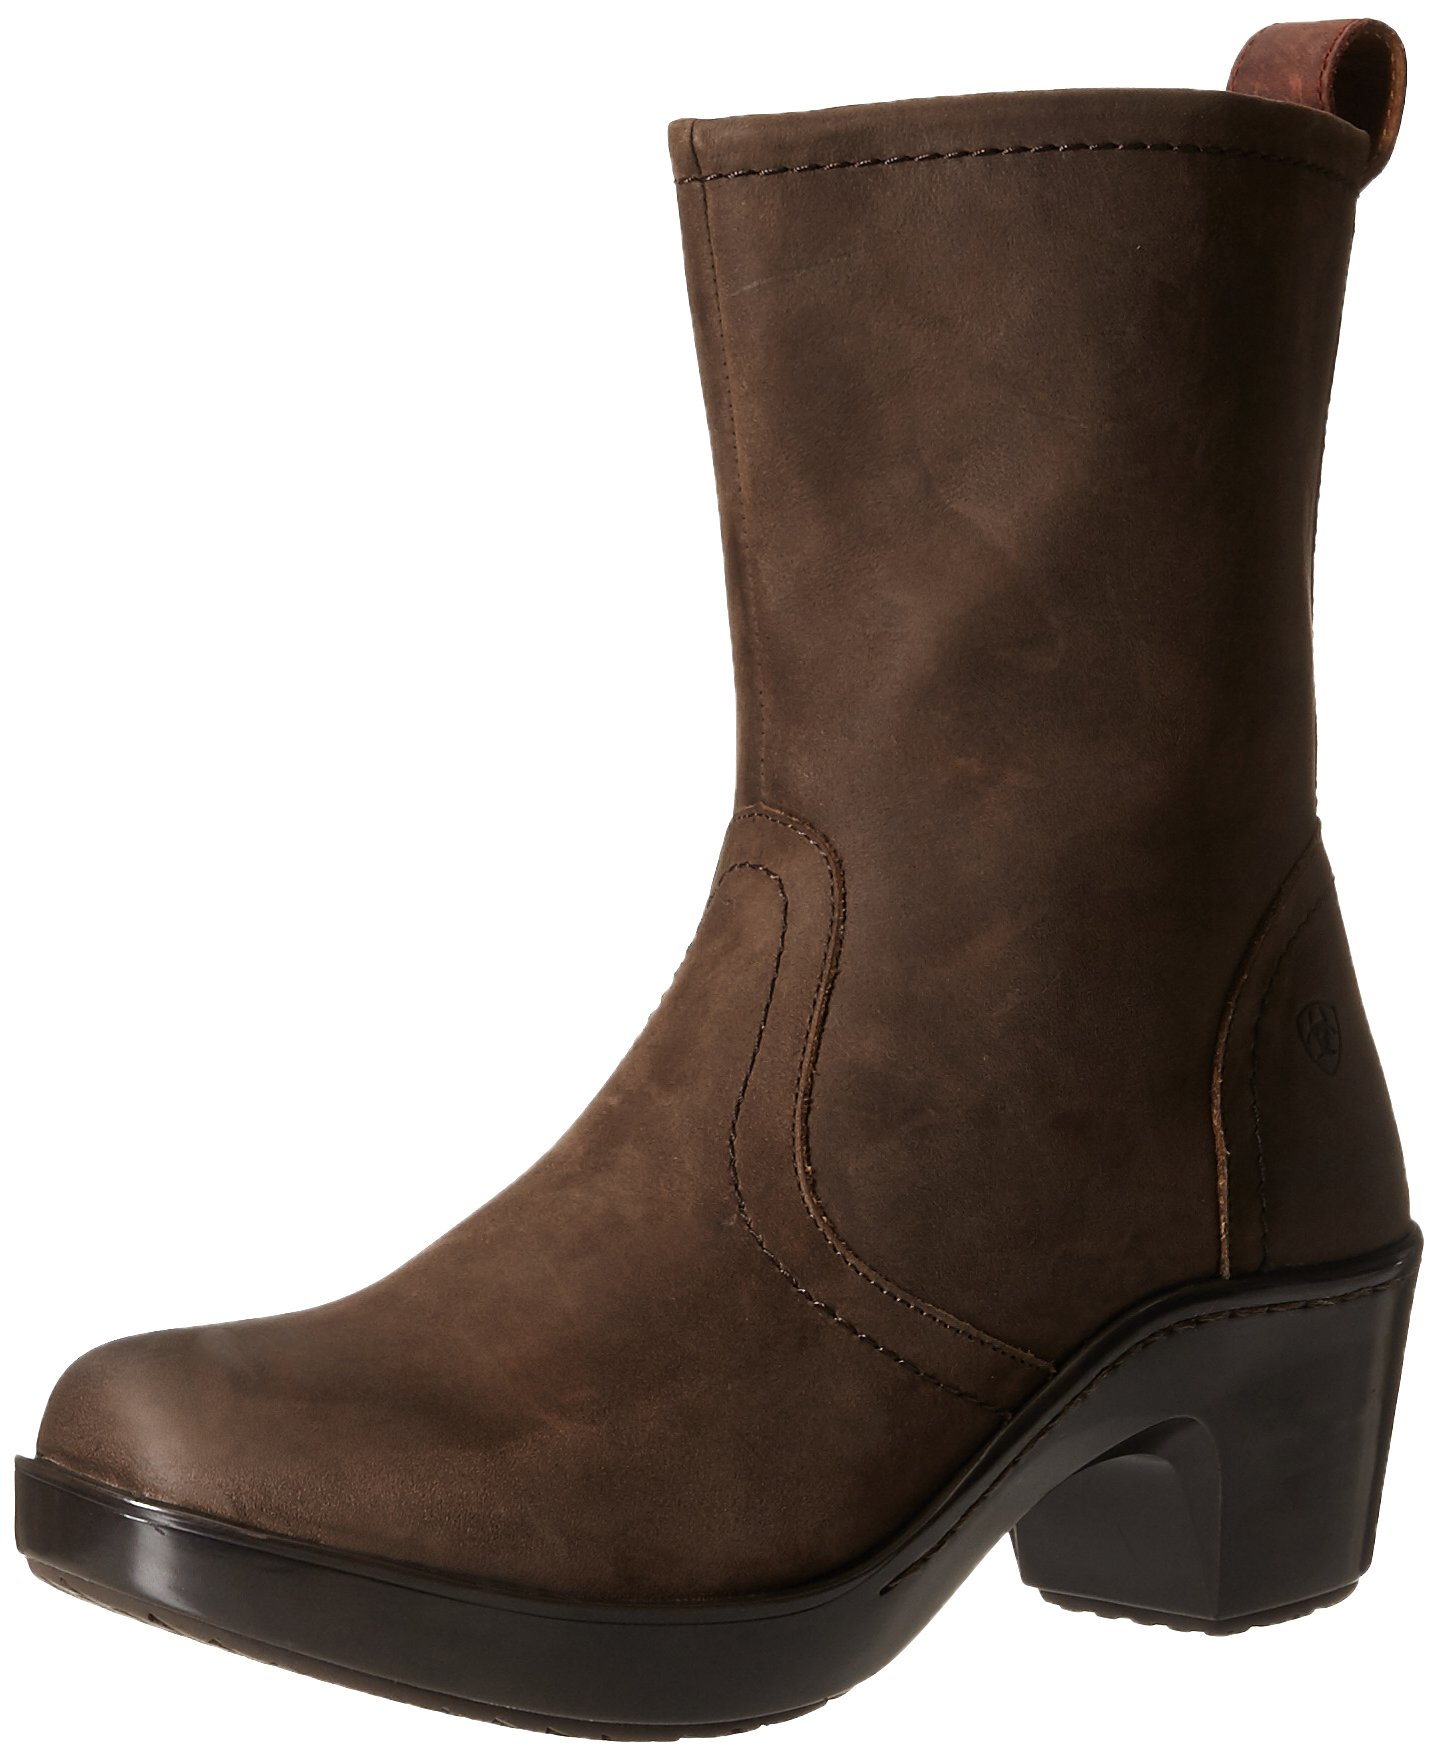 Ariat Women's Brittany Fashion Boot,  Espresso,  9.5 M US